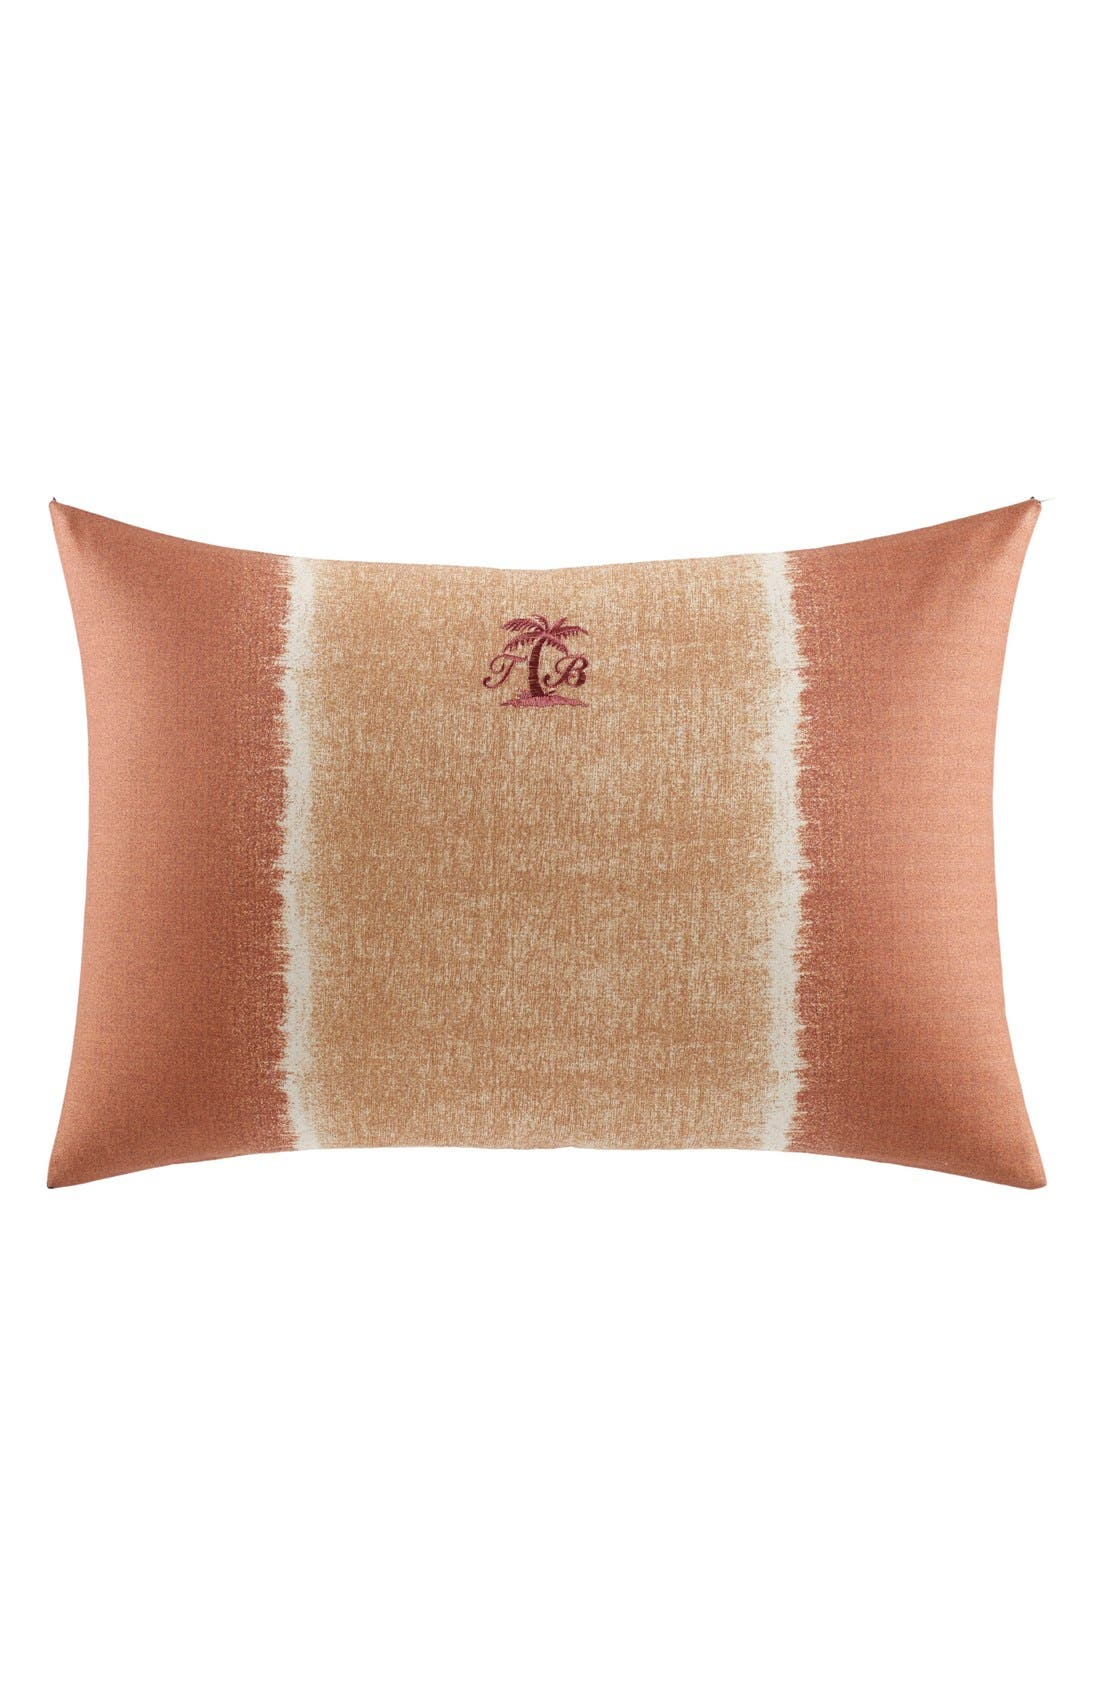 Cayo Coco Ikat Pillow,                         Main,                         color, 200